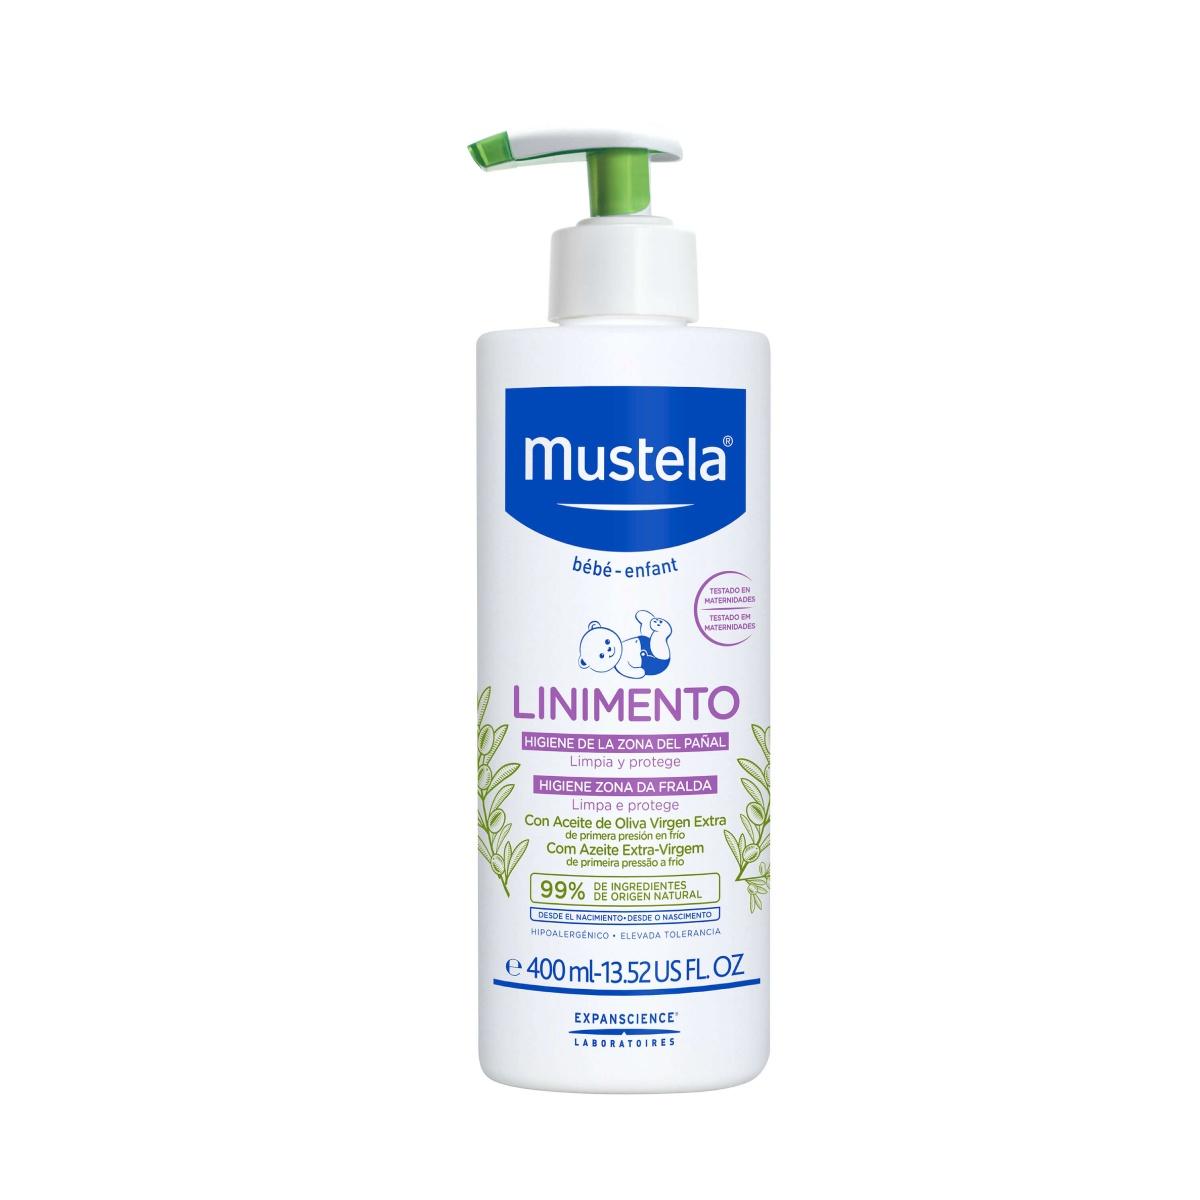 Mustela - Creme Hidratante MUSTELA Linimento (400 ml)